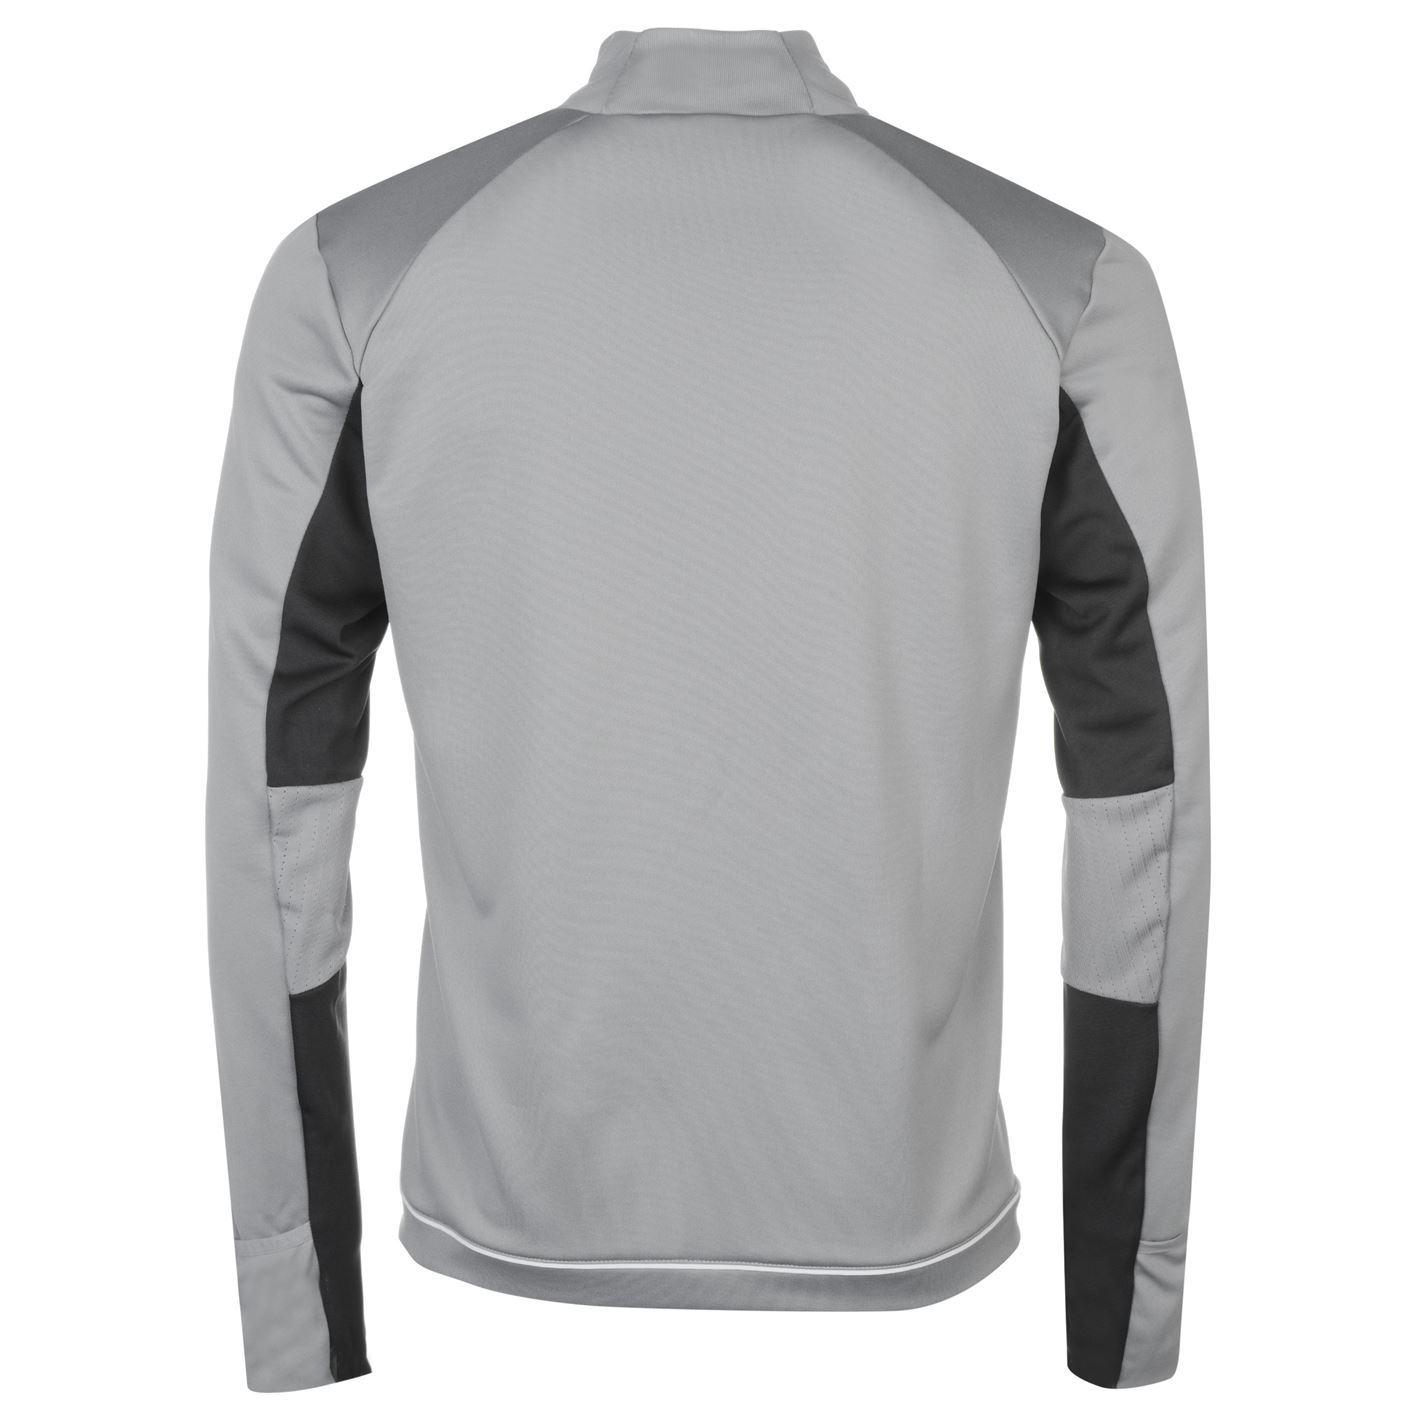 ... adidas Manchester United Training Sweatshirt Mens Grey White Football  Soccer Top ... 75ac1485e955